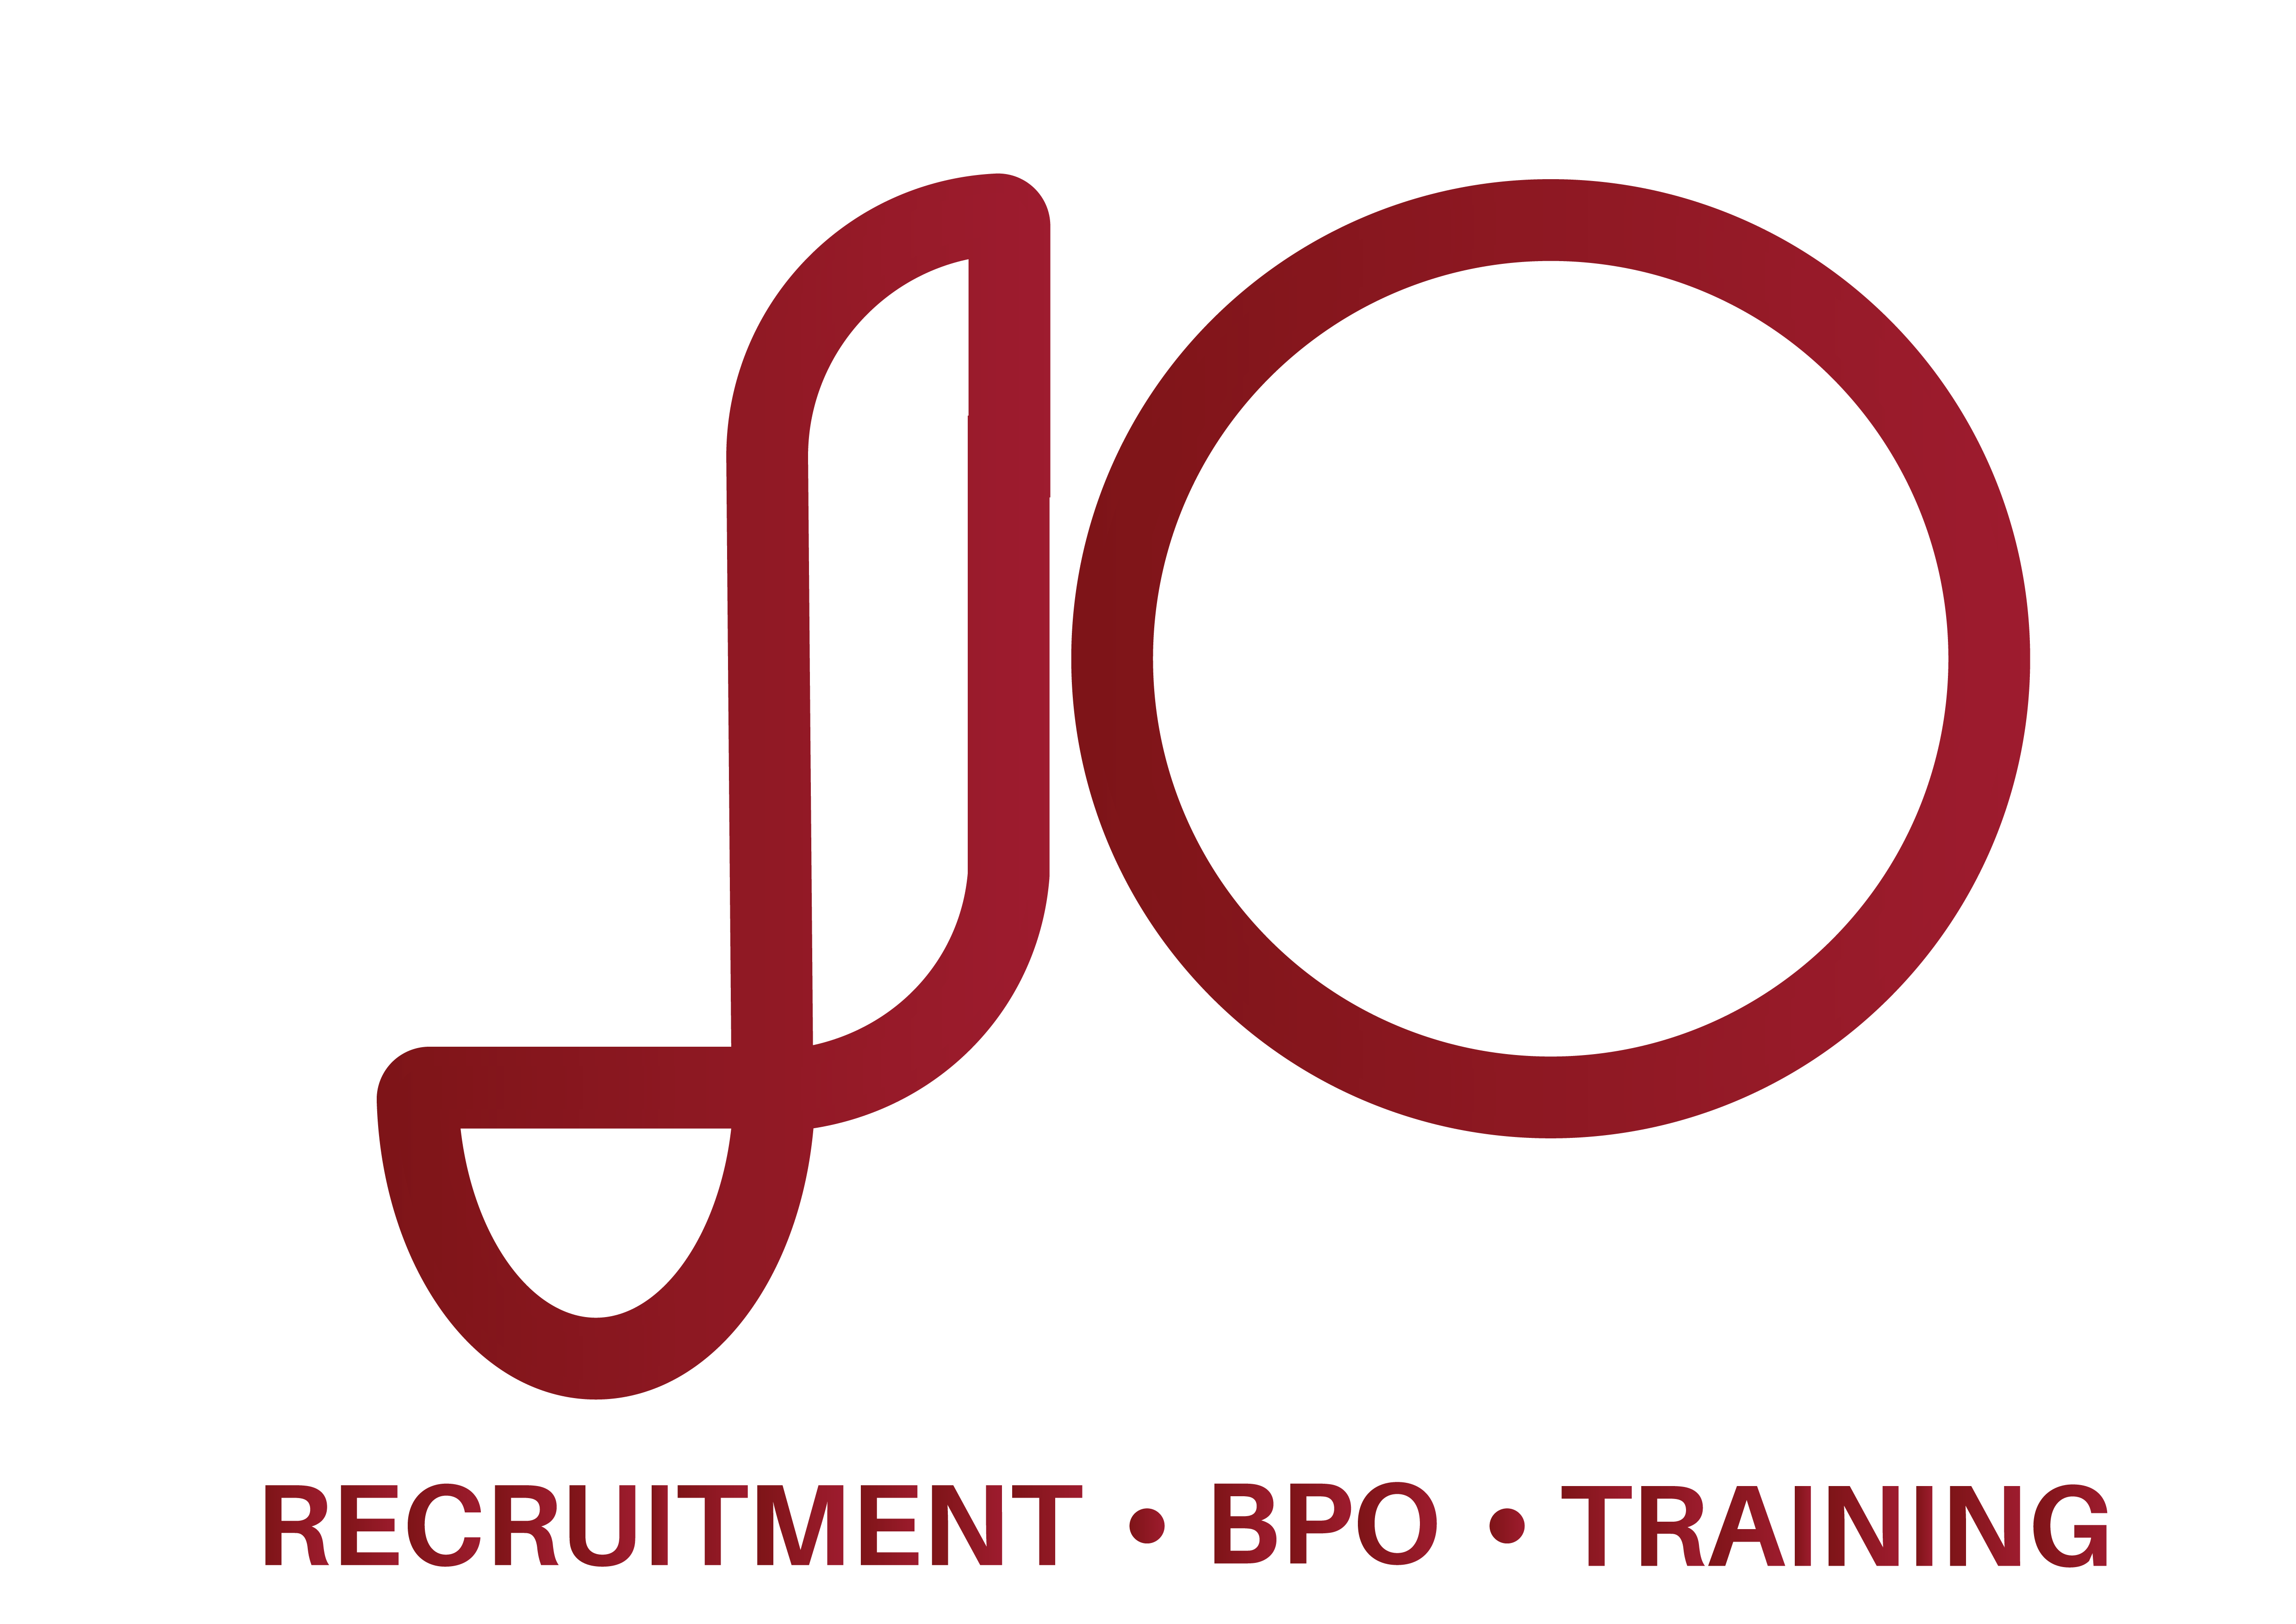 JO Recruitment BPO Training